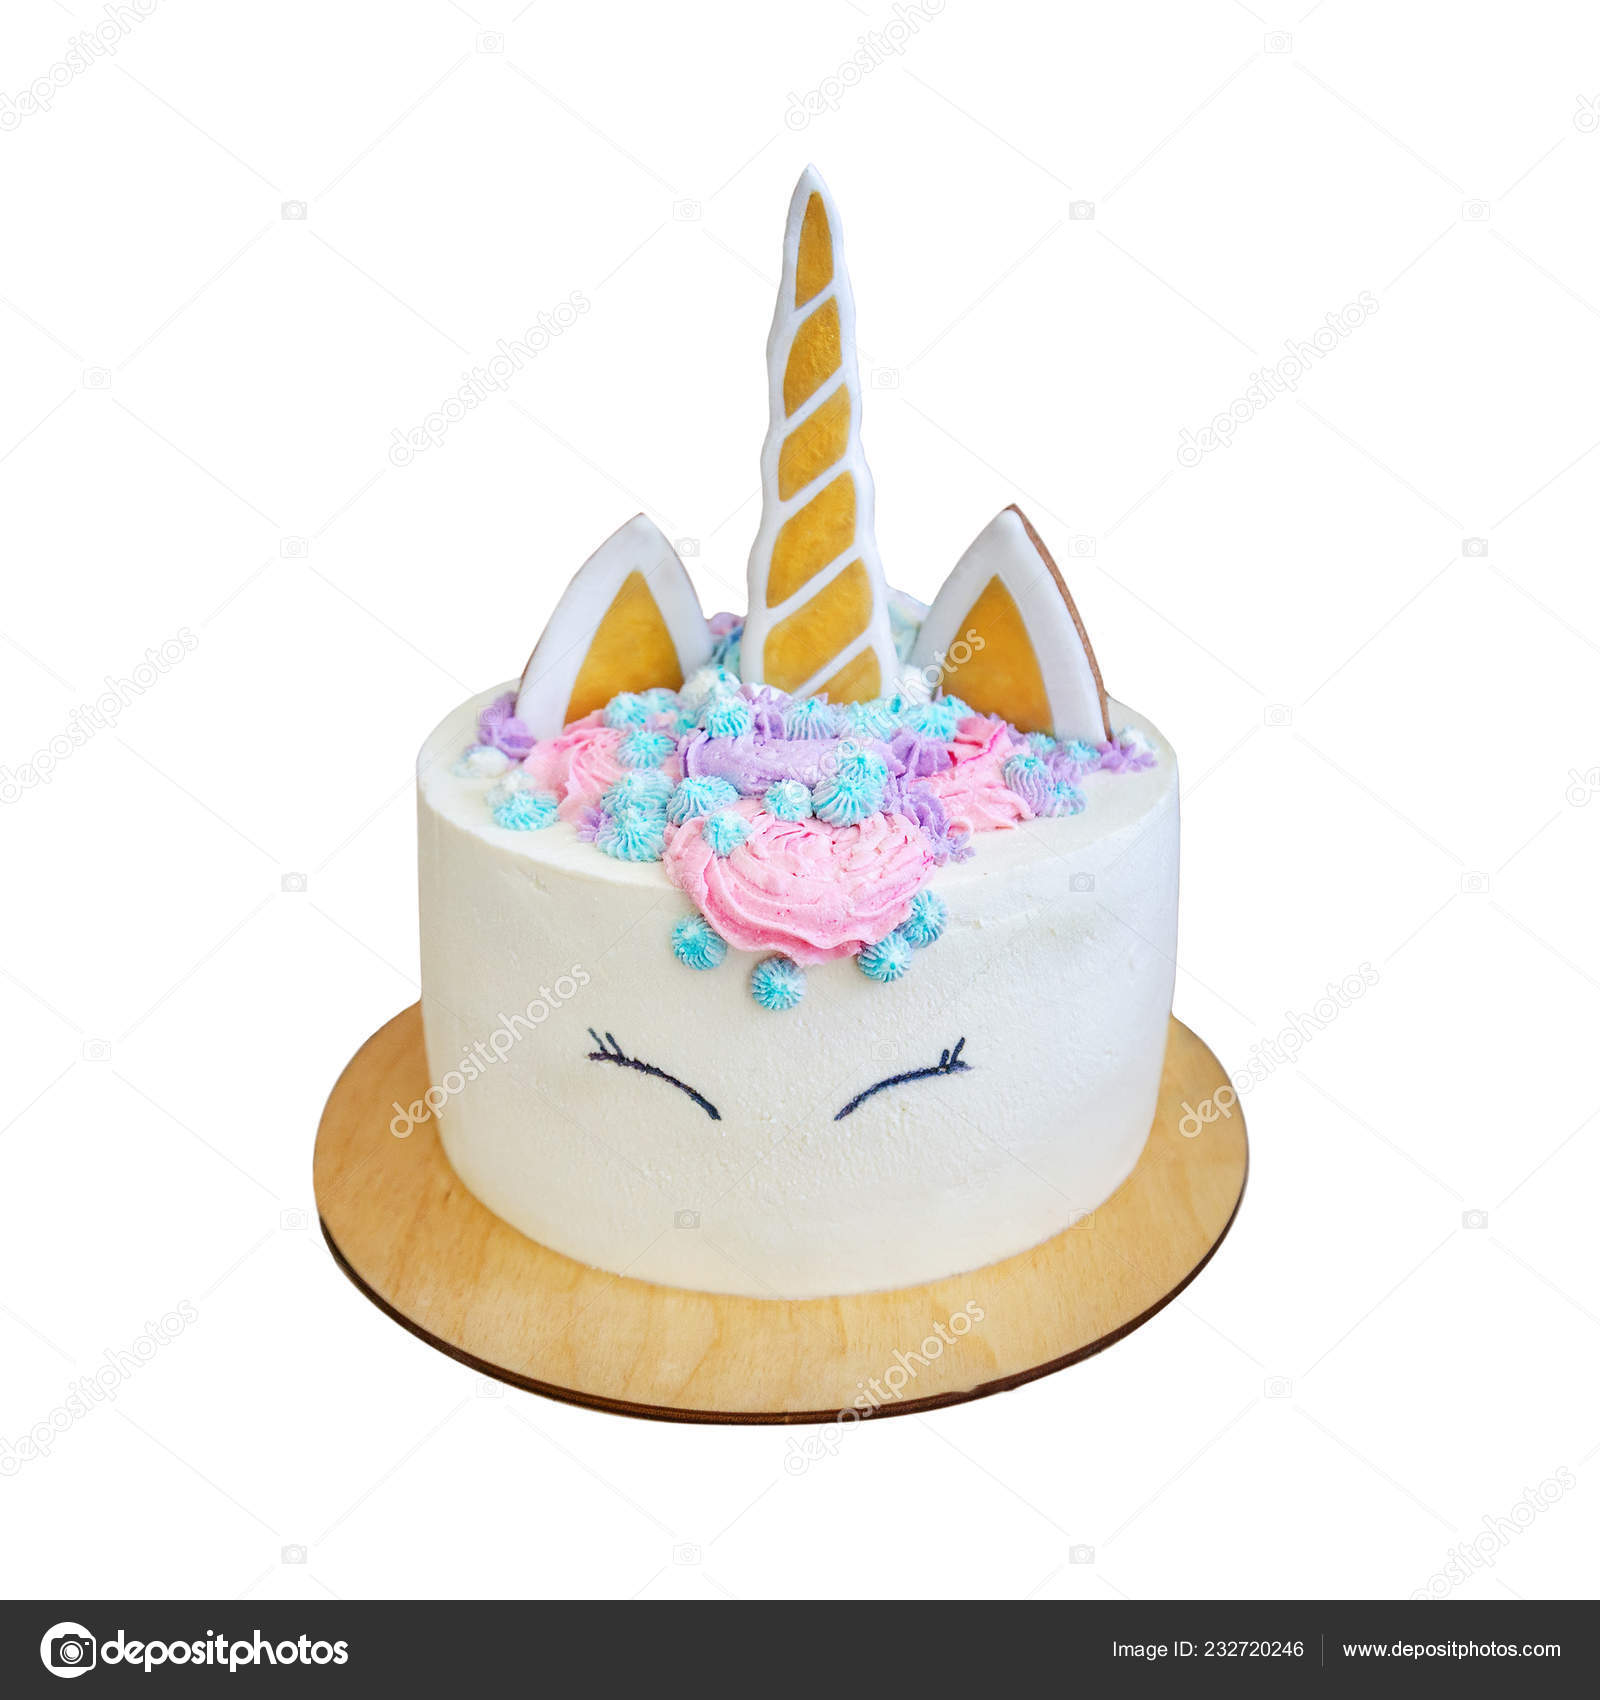 Beautiful Bright Delicious Birthday Cake Girls Decorated